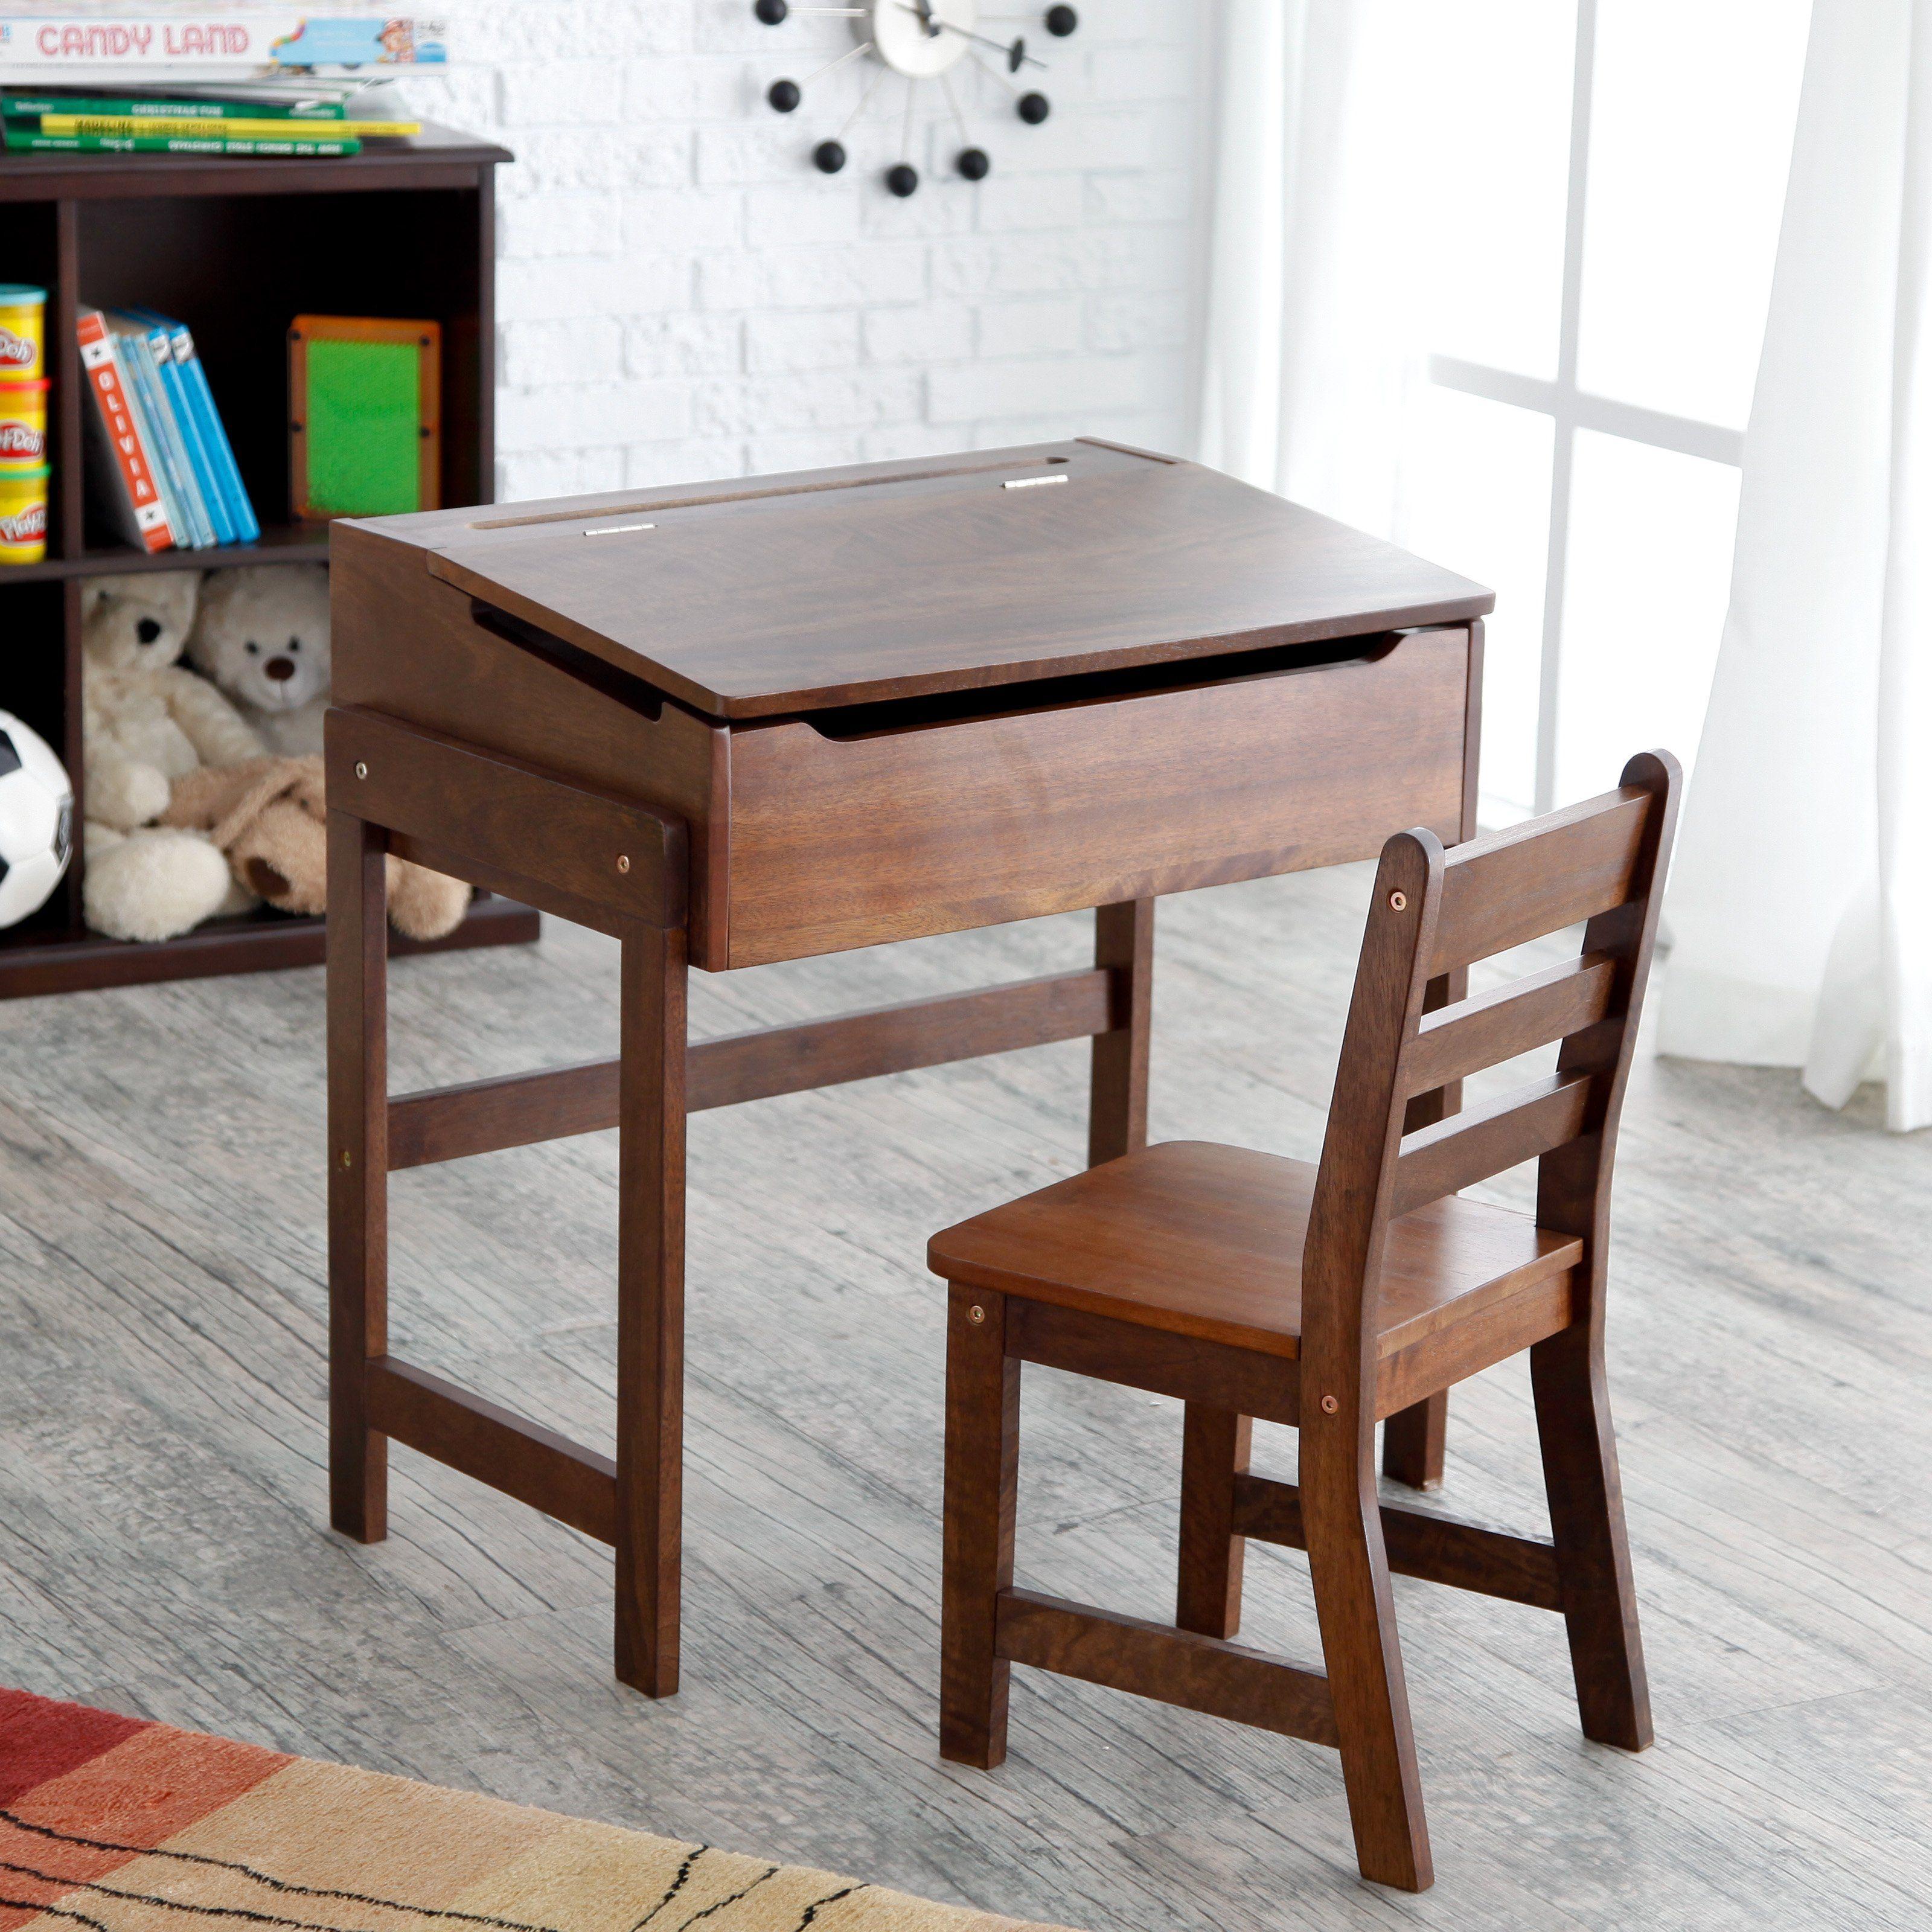 Schoolhouse Desk And Chair Set Walnut Www Hayneedle Com Desk And Chair Set Childrens Furniture Desk Set